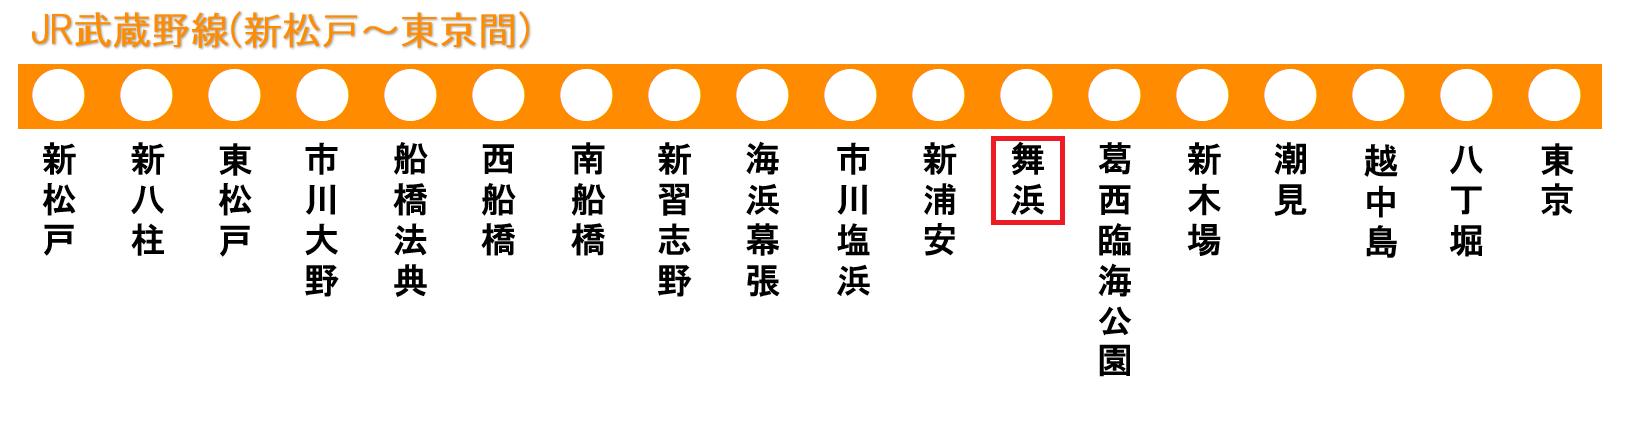 JR武蔵野線の路線図(舞浜駅)